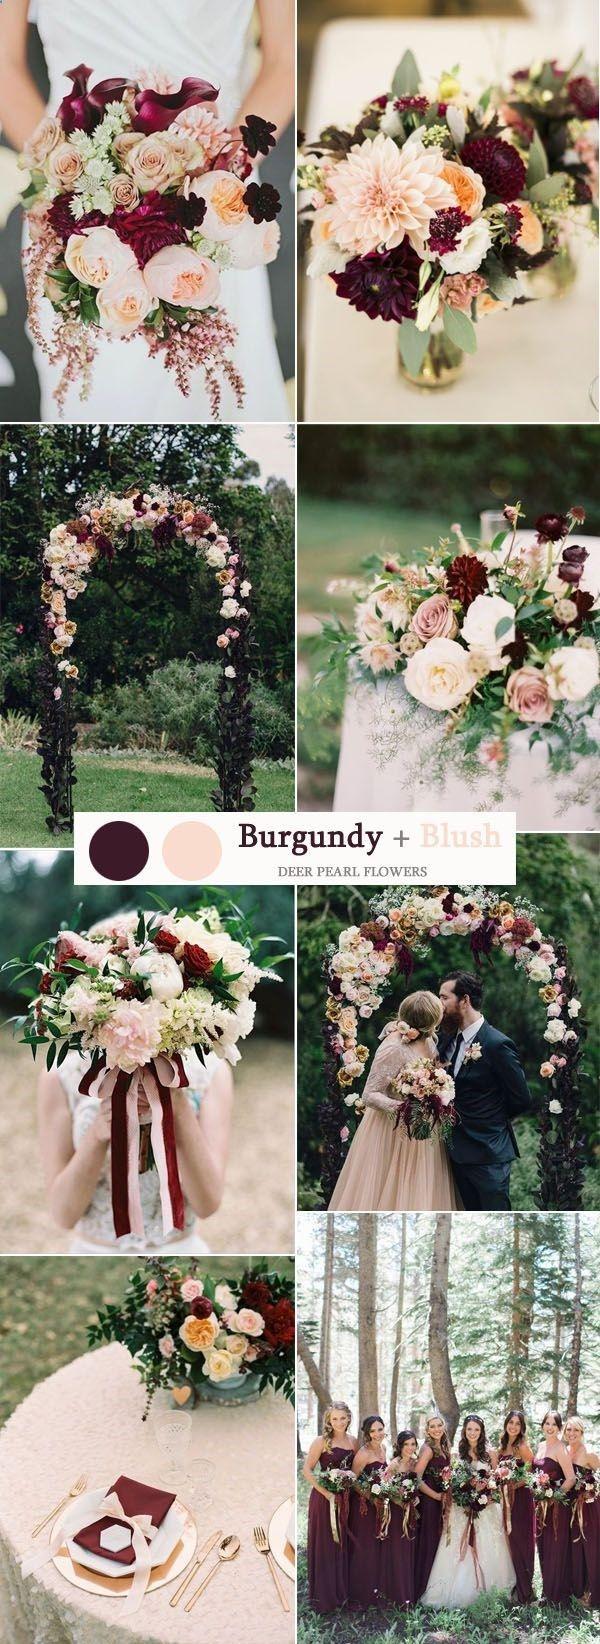 burgundy and blush fall autumn wedding colors ideas / www.deerpearlflow...